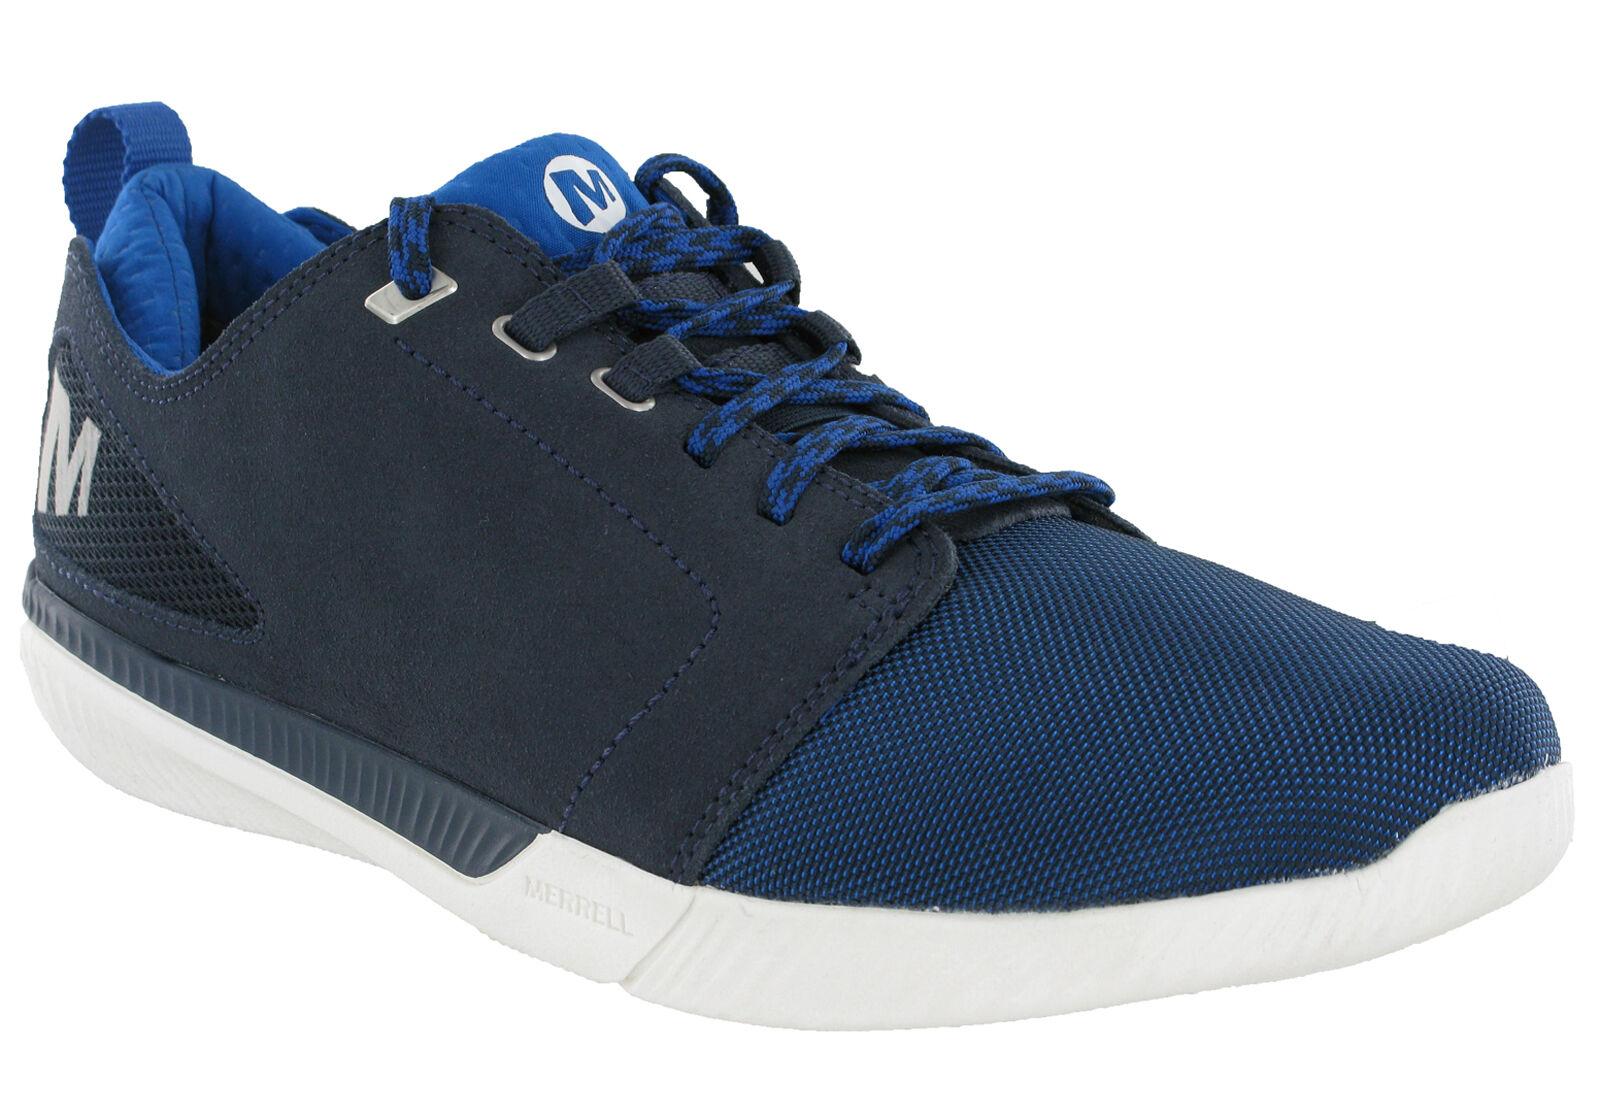 Merrell Roust Frenzy Azul Marino Zapatillas Zapatos De Gamuza Cuero Ligero MENS ACOLCHADO